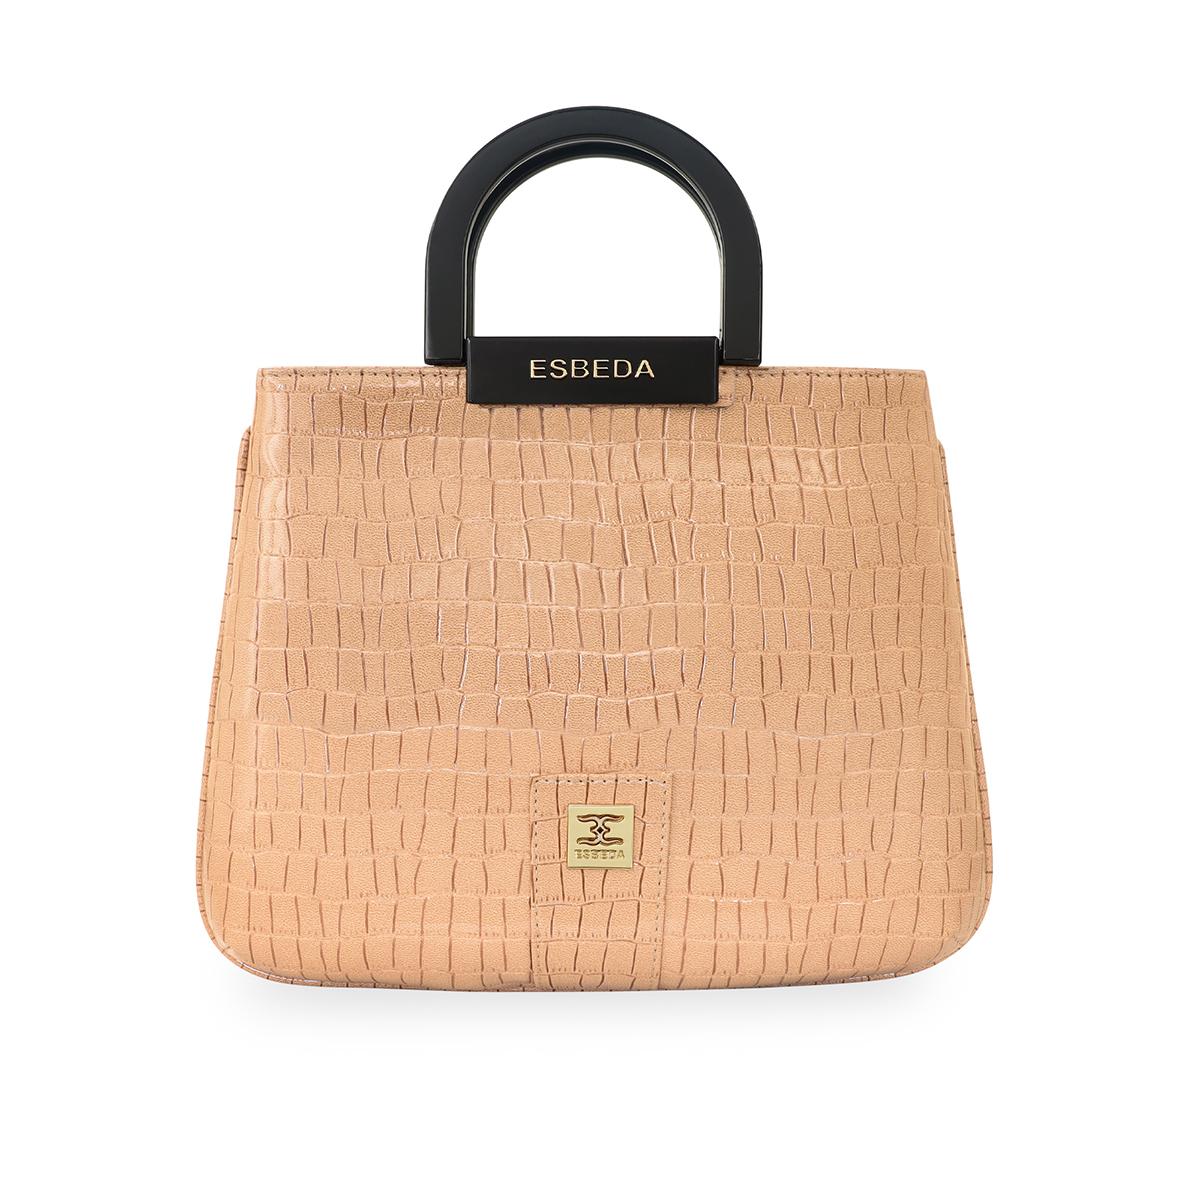 ESBEDA | ESBEDA Beige Color Glossy shell Lightweight Handbag For Women